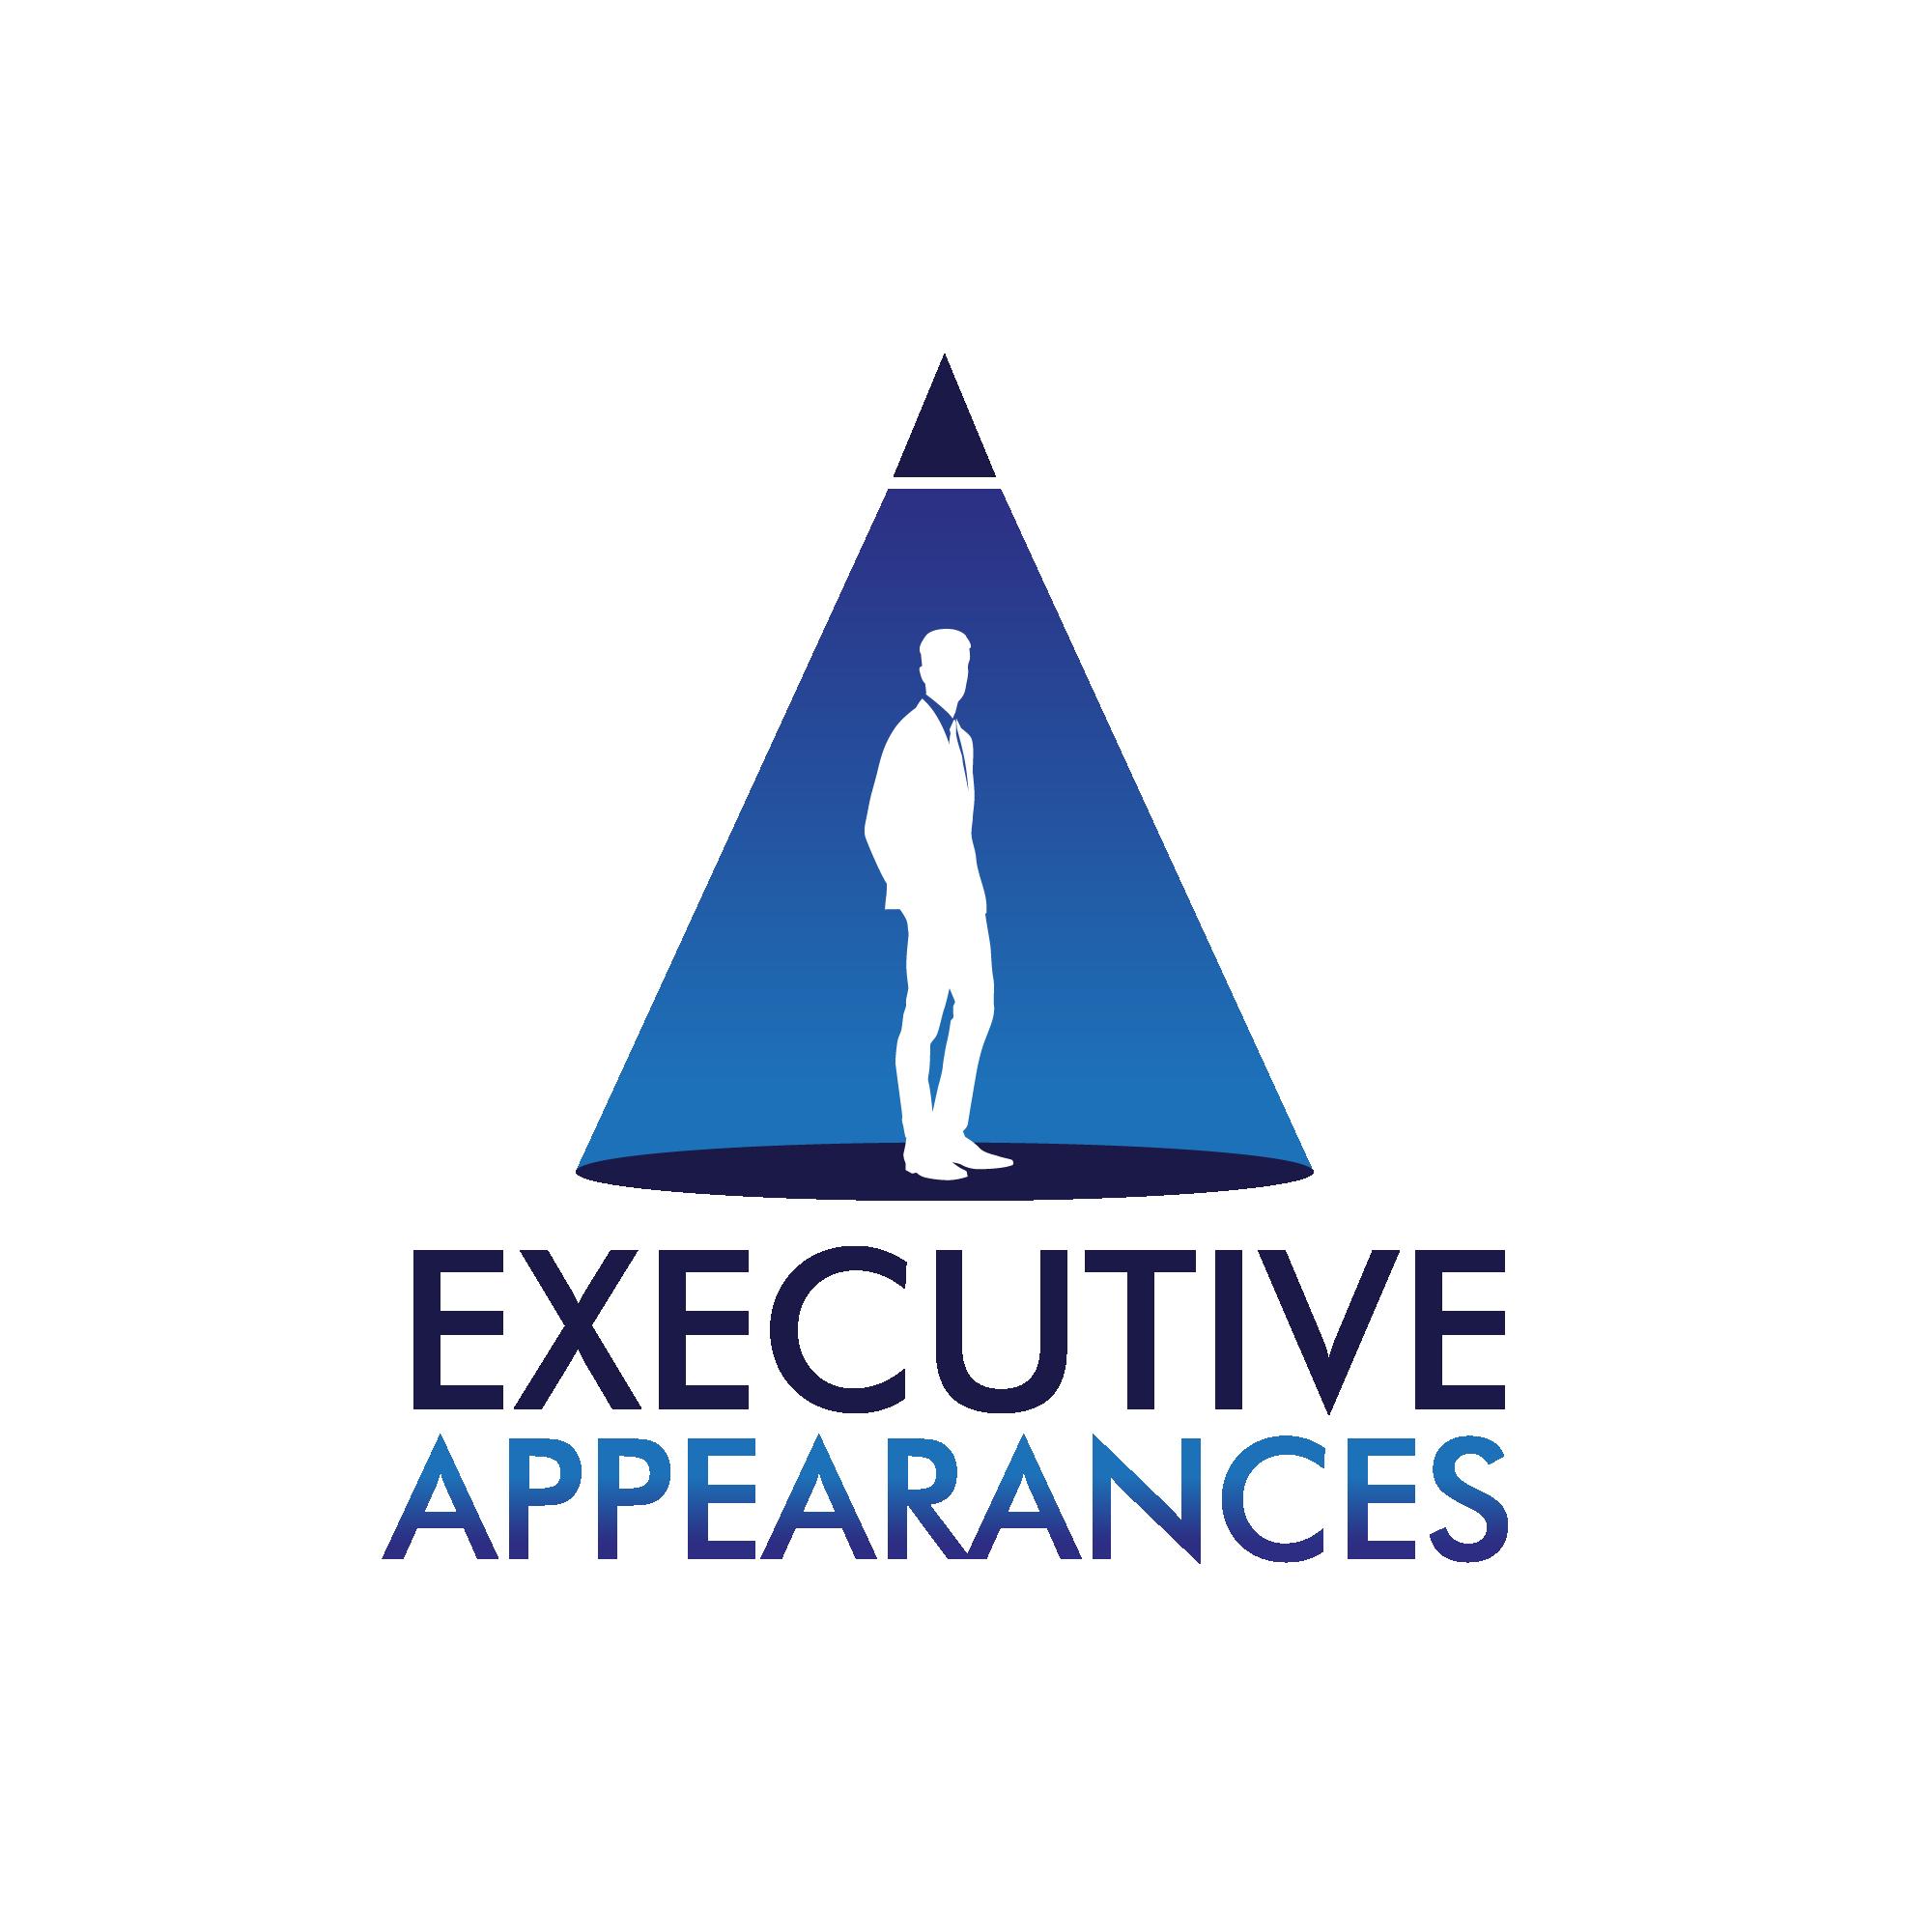 Logo_Executive_Appareances_04_-_Proposal-01.png